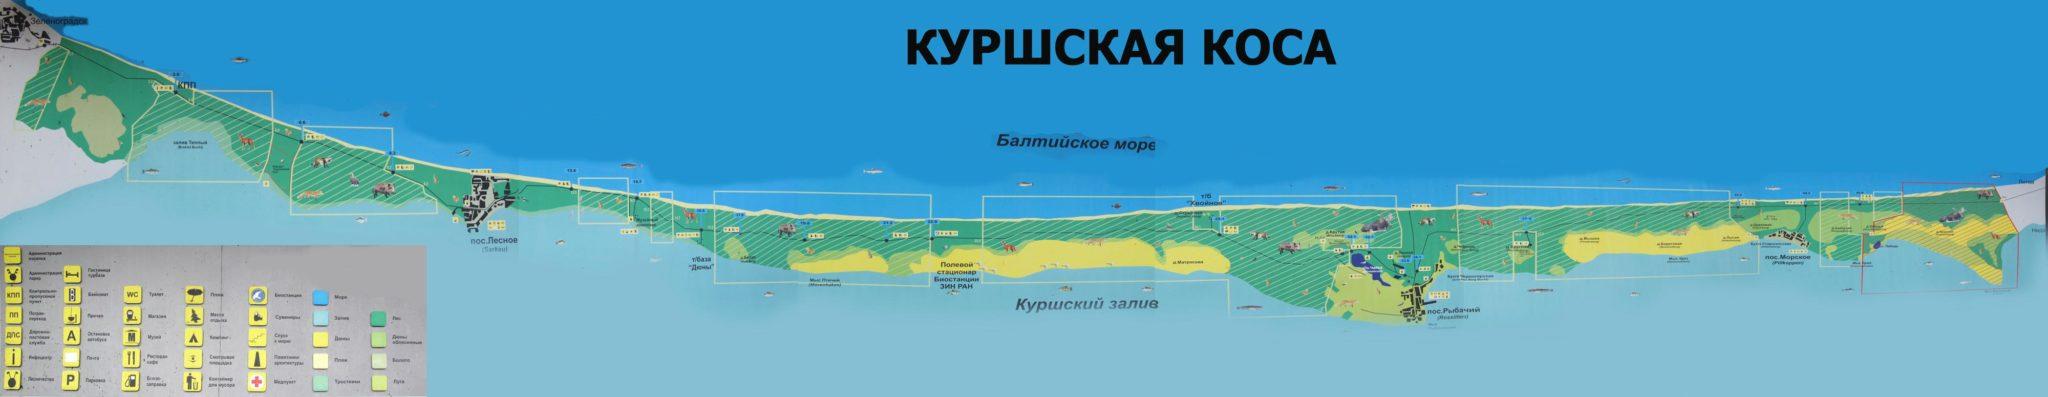 карта куршской косы калининградской области